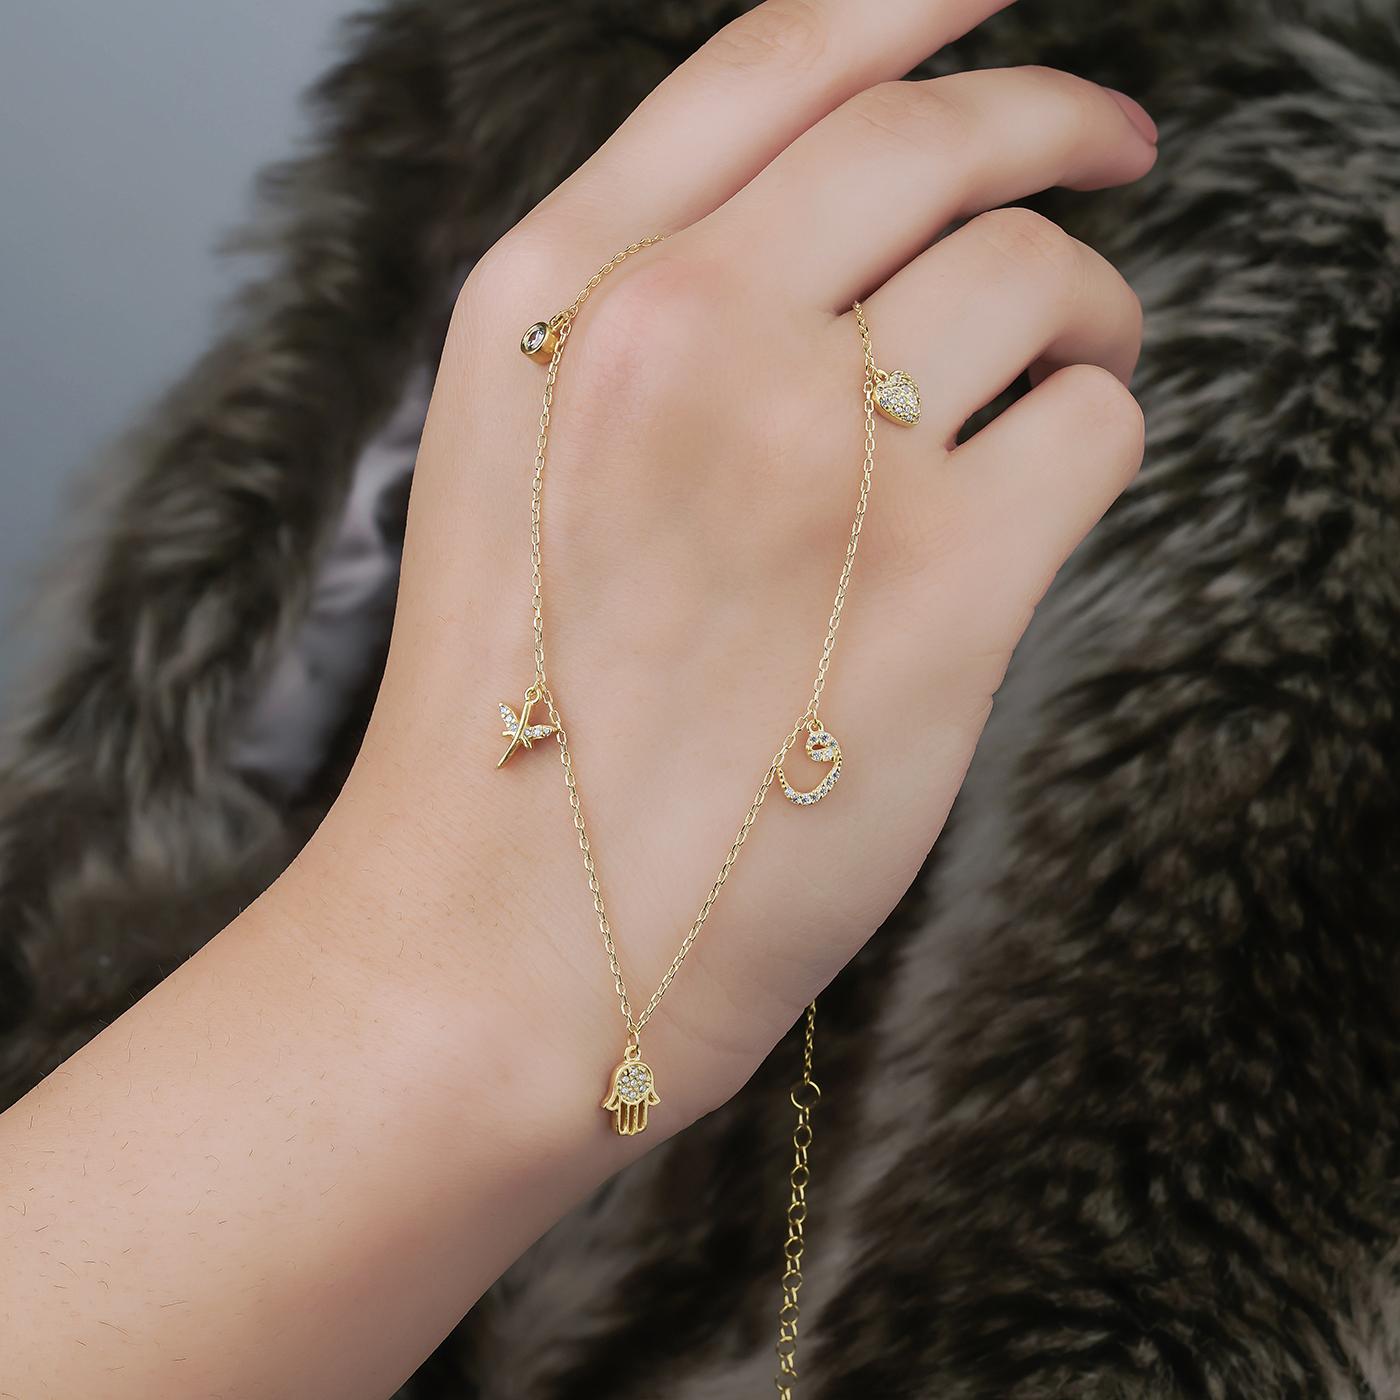 ALMIRA 925 Sterling Silber Damen Halskette Glückskette Anhänger Silberschmuck Zirkonia